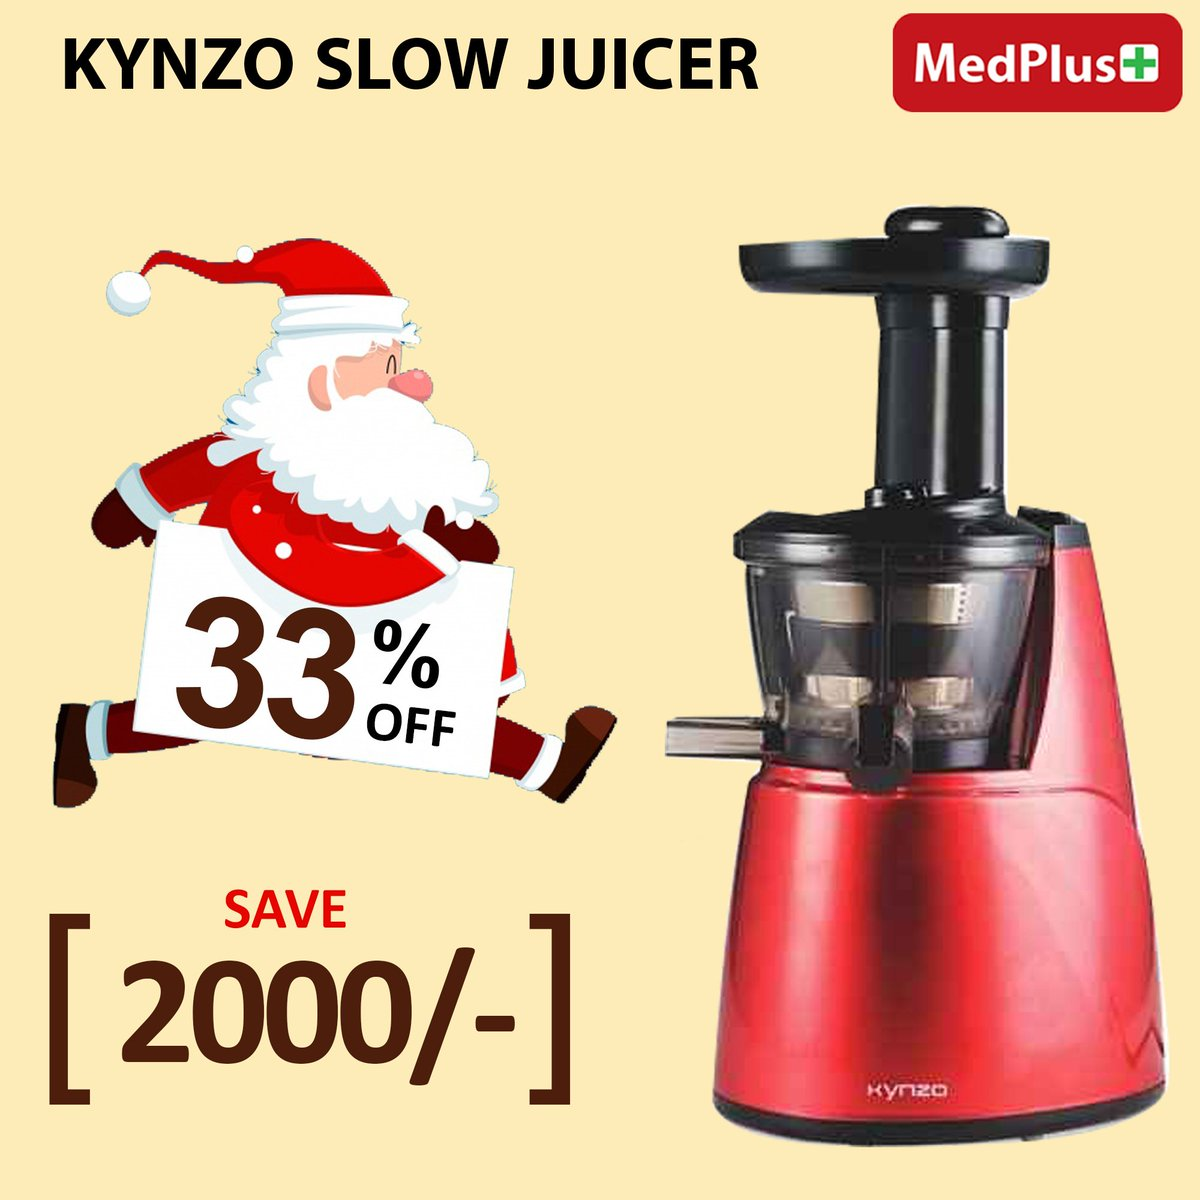 Meet the kynzo slow juicer